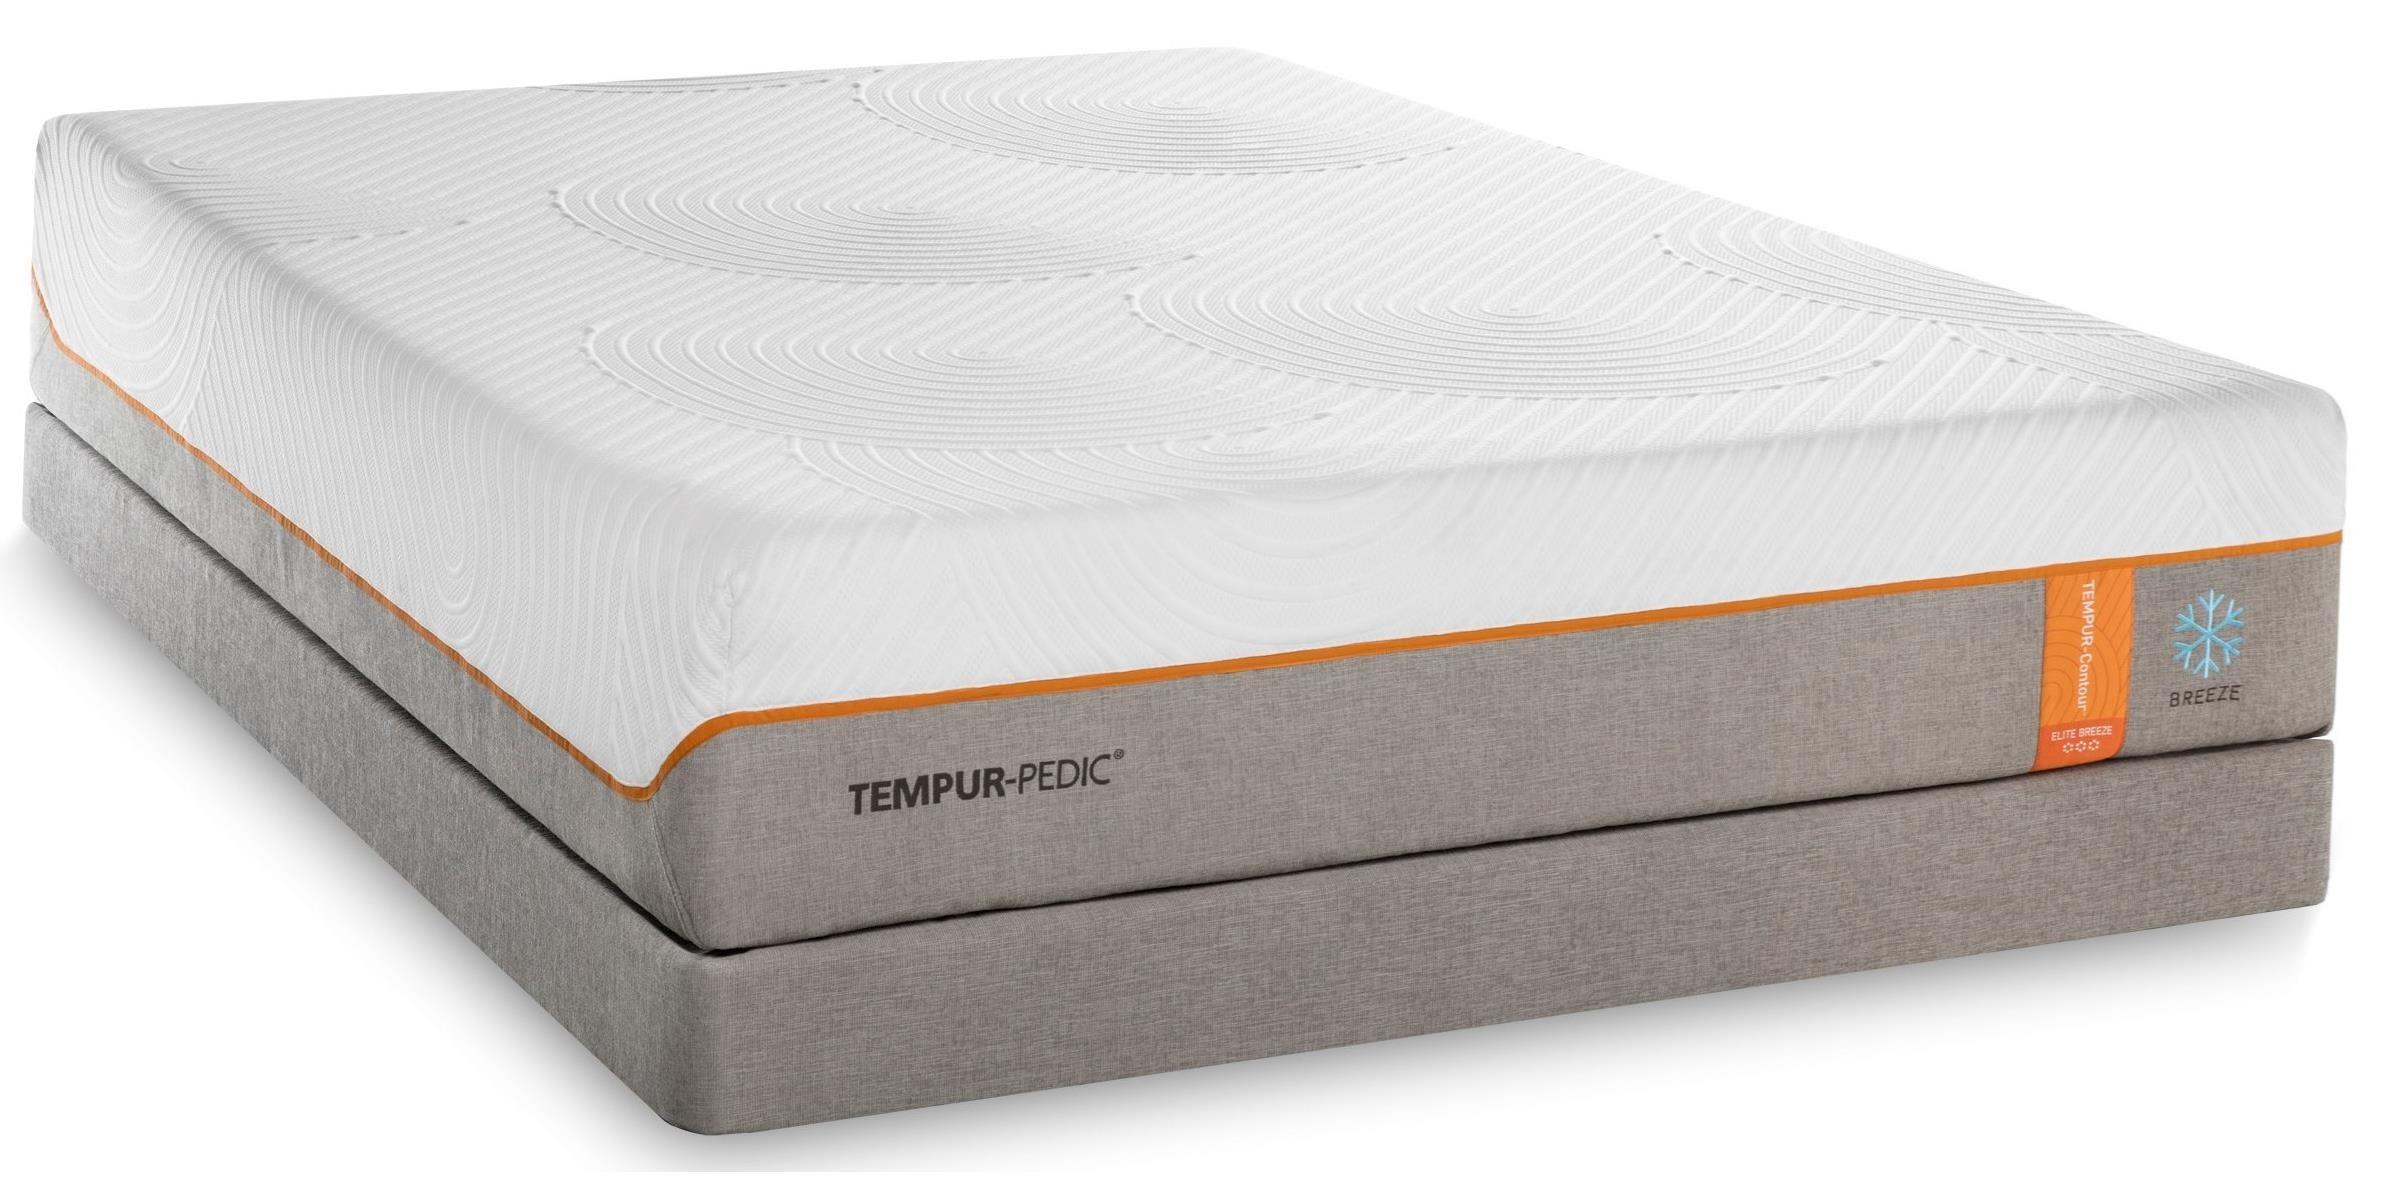 Tempur-Pedic® TEMPUR-Contour Elite Breeze King Medium-Firm Mattress Set - Item Number: 10290270+2x21510120